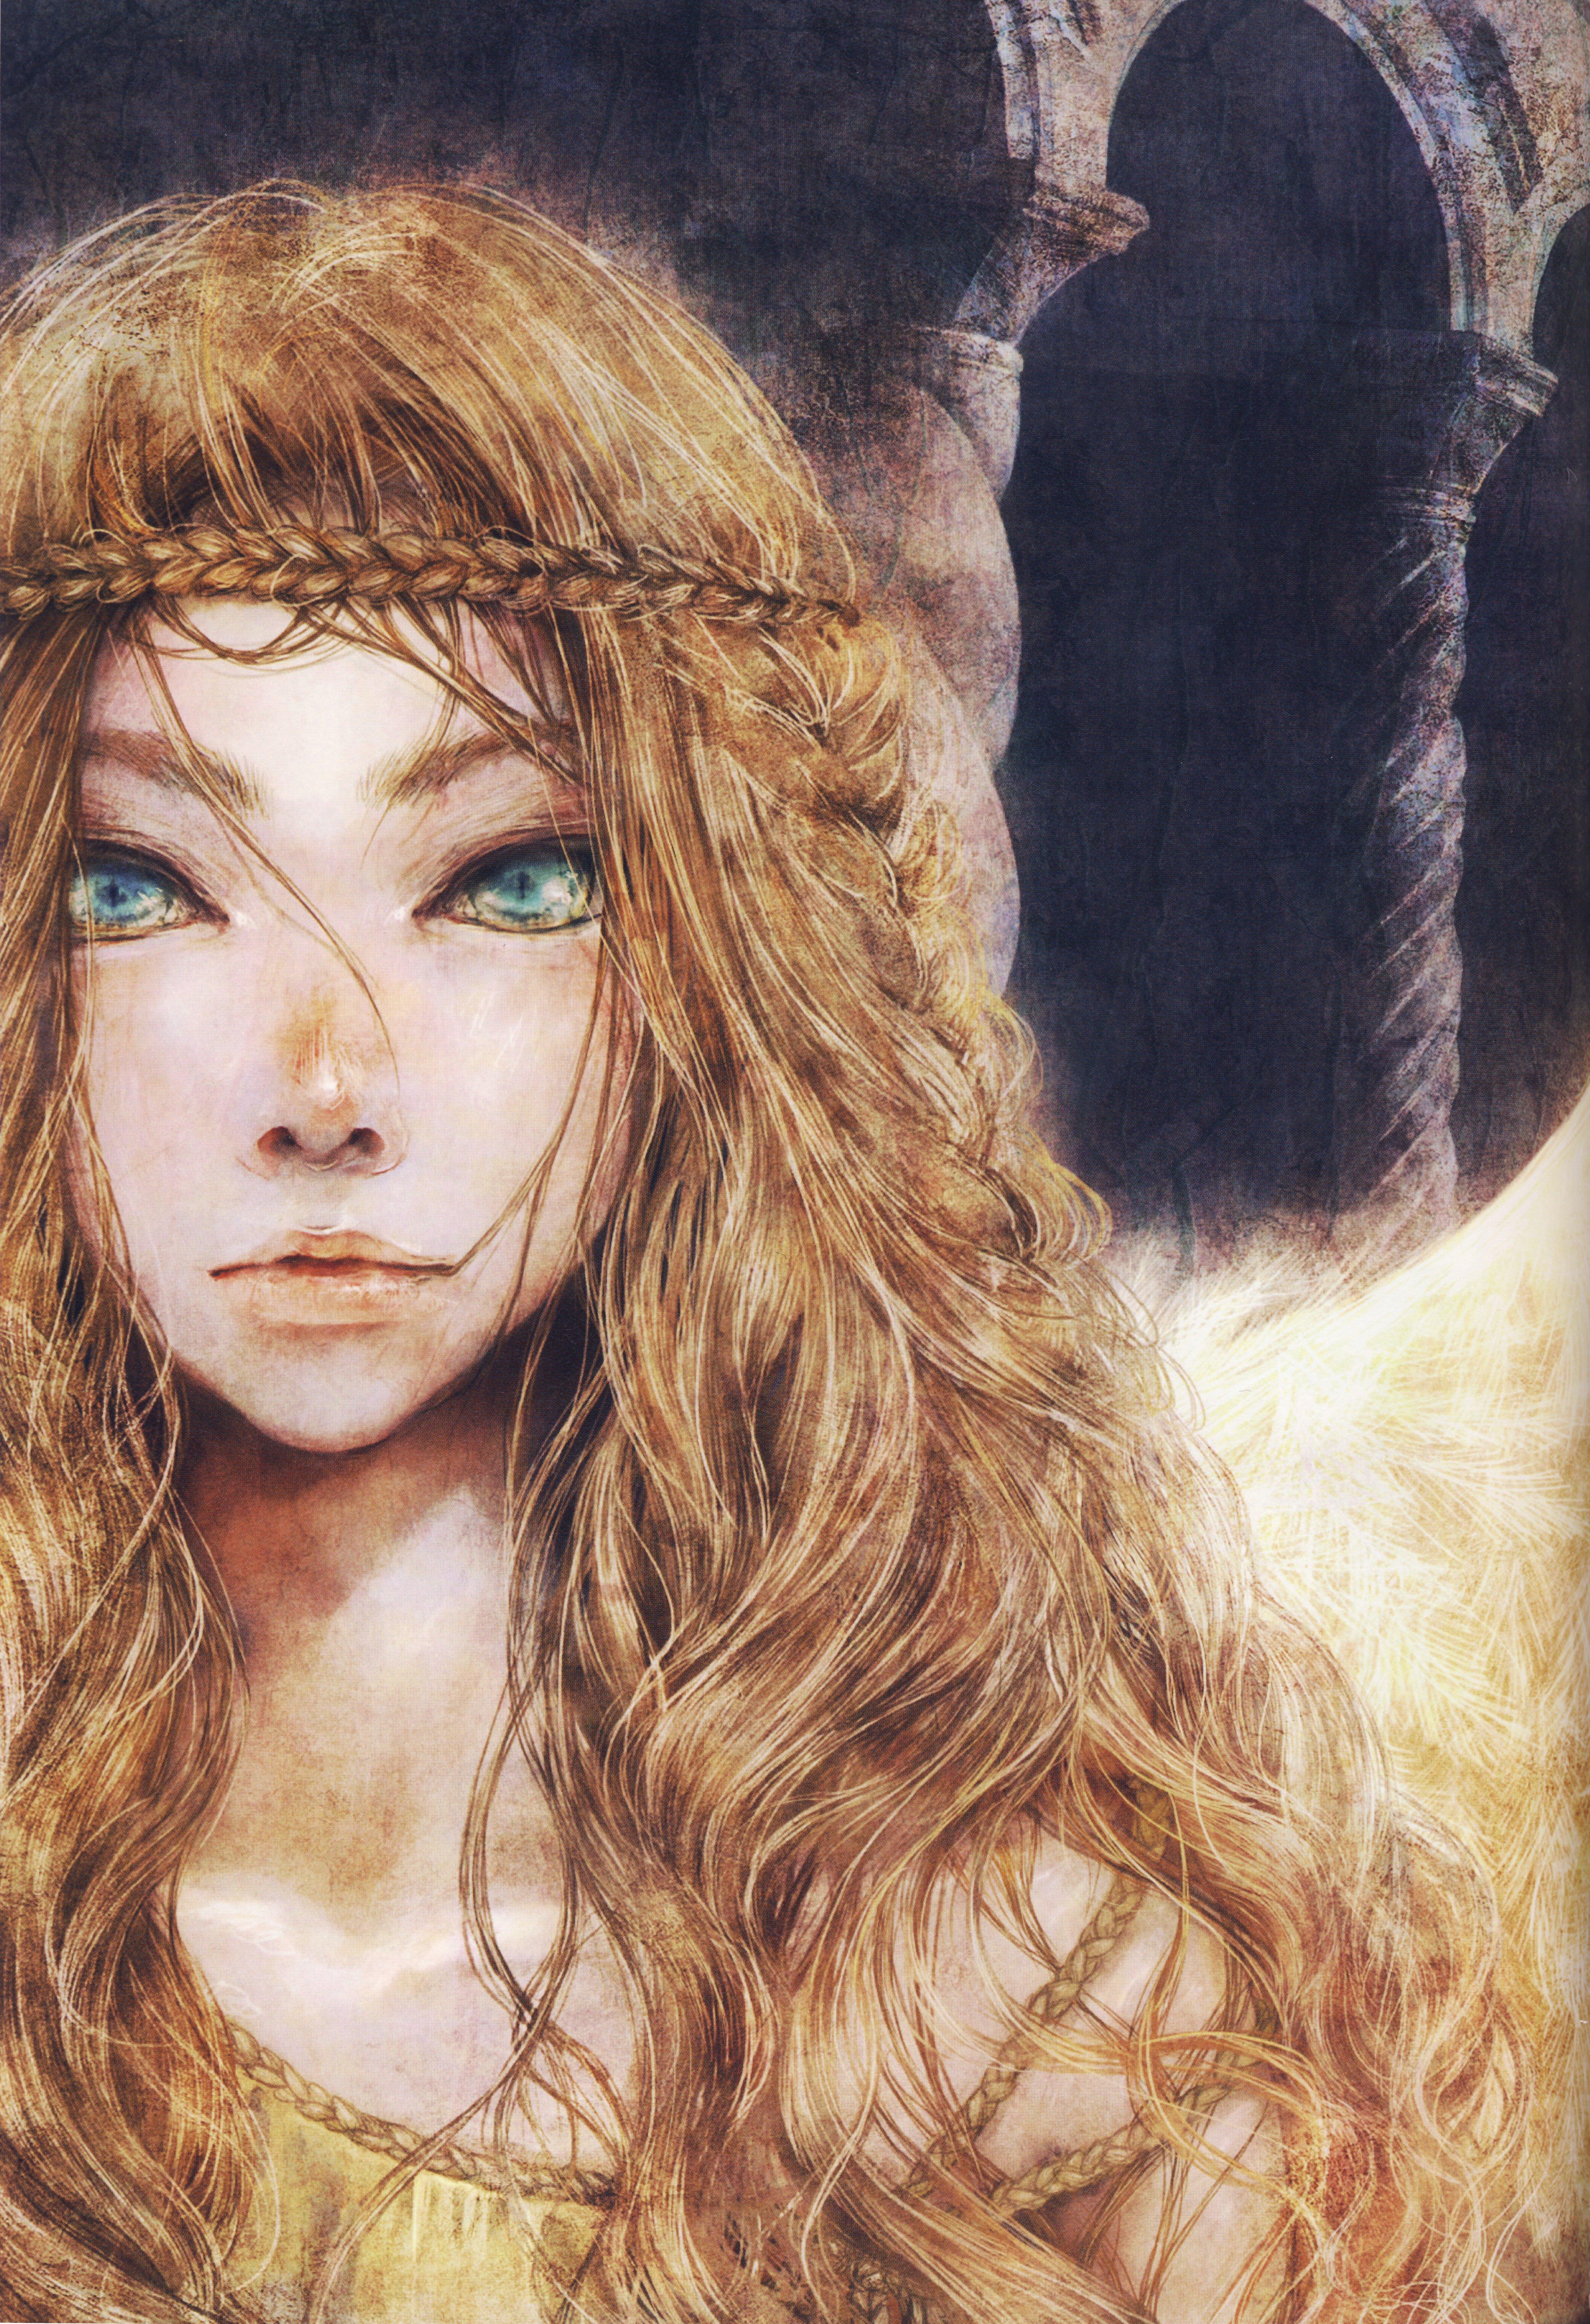 Anime Girl Artwork Beautiful Long Hair Blonde Angel Green Eyes